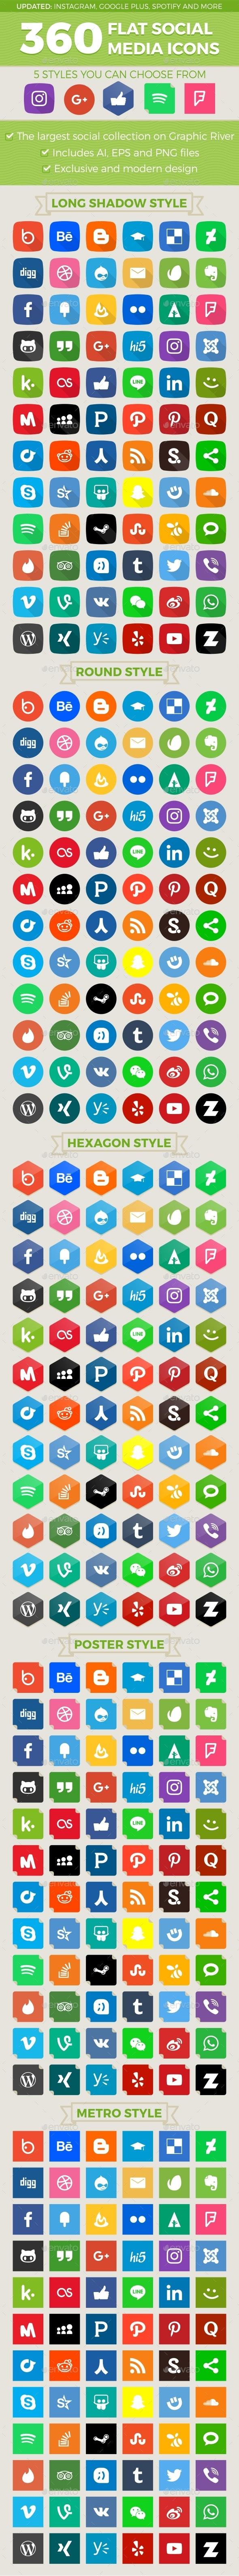 Social Media Icons - Media Icons